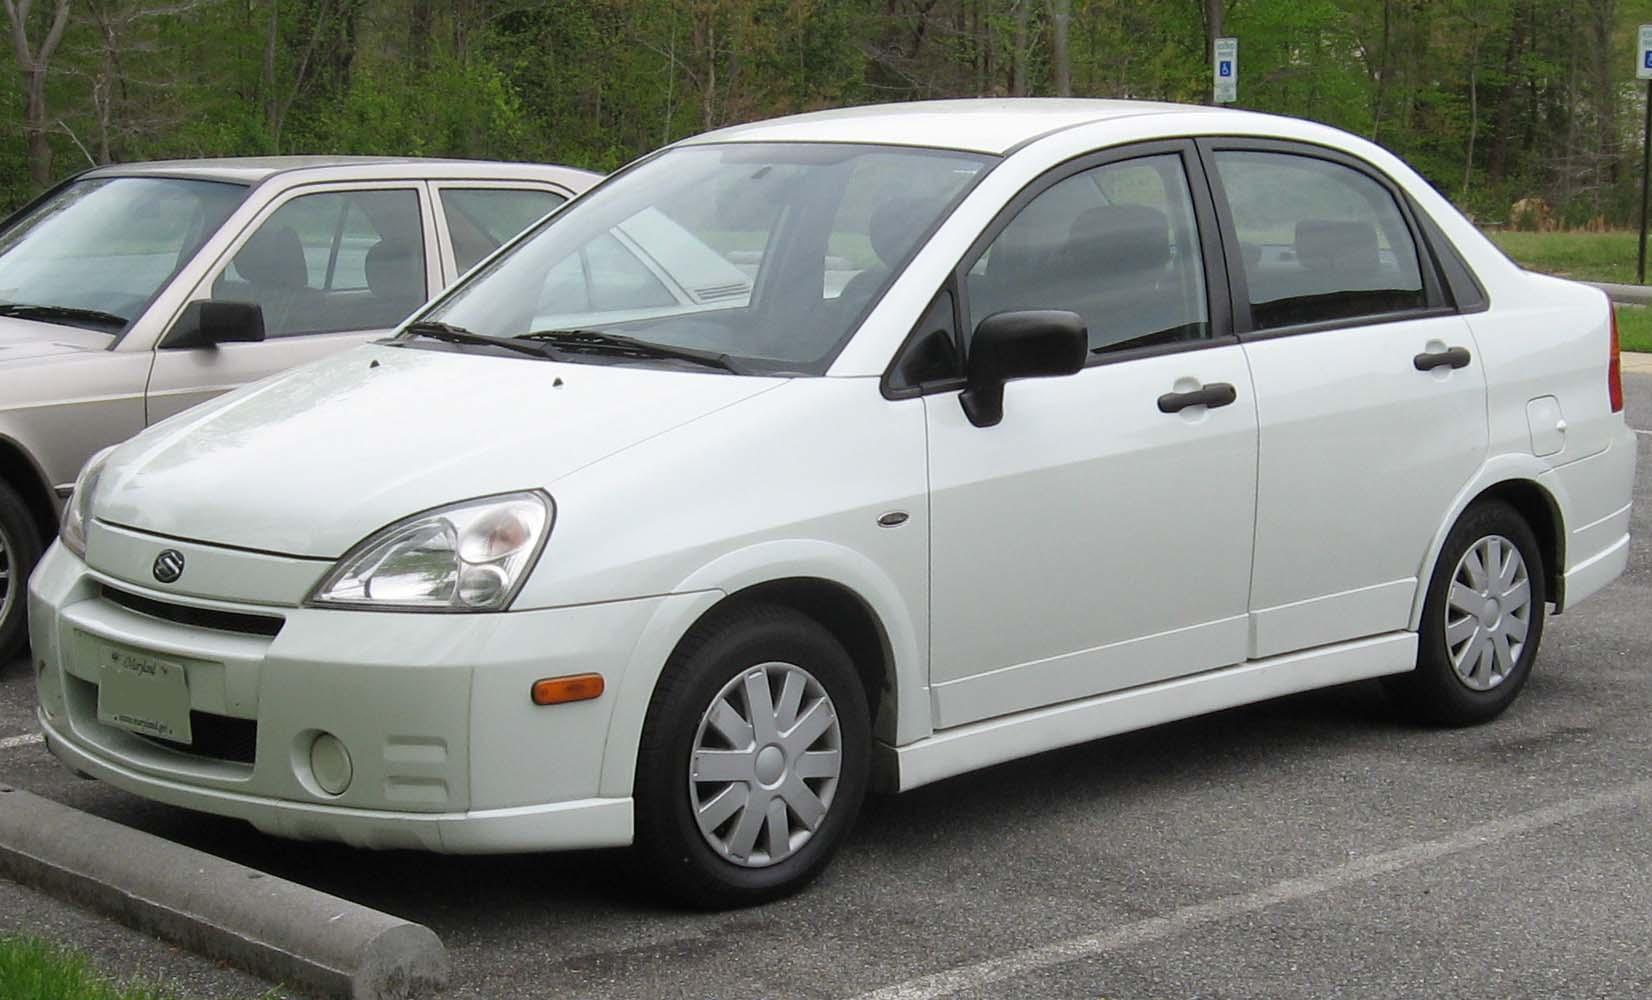 Suzuki Aerio sedan High Resolution Wallpaper Free